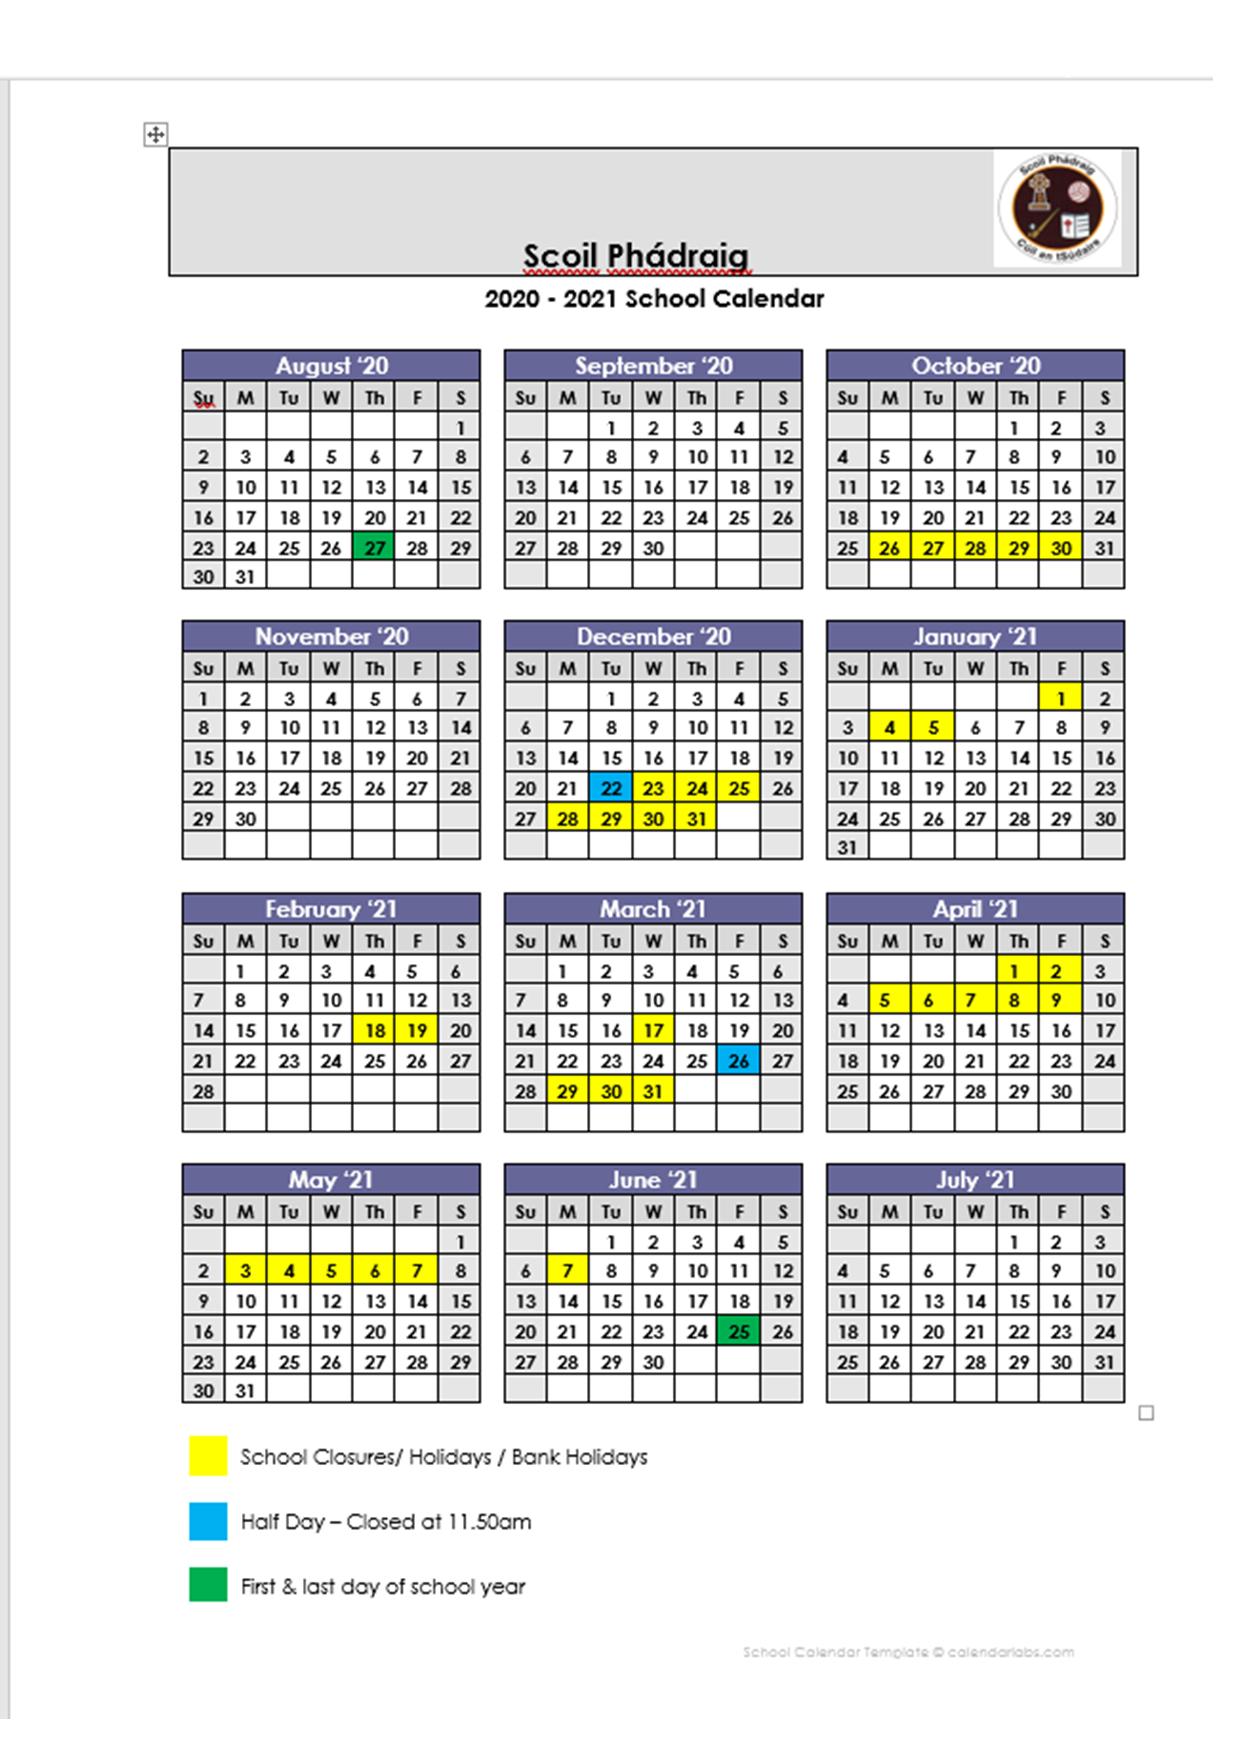 School Calendar 2020/2021 – St Patricks Bns for Smithtown School Calendar 2021 20